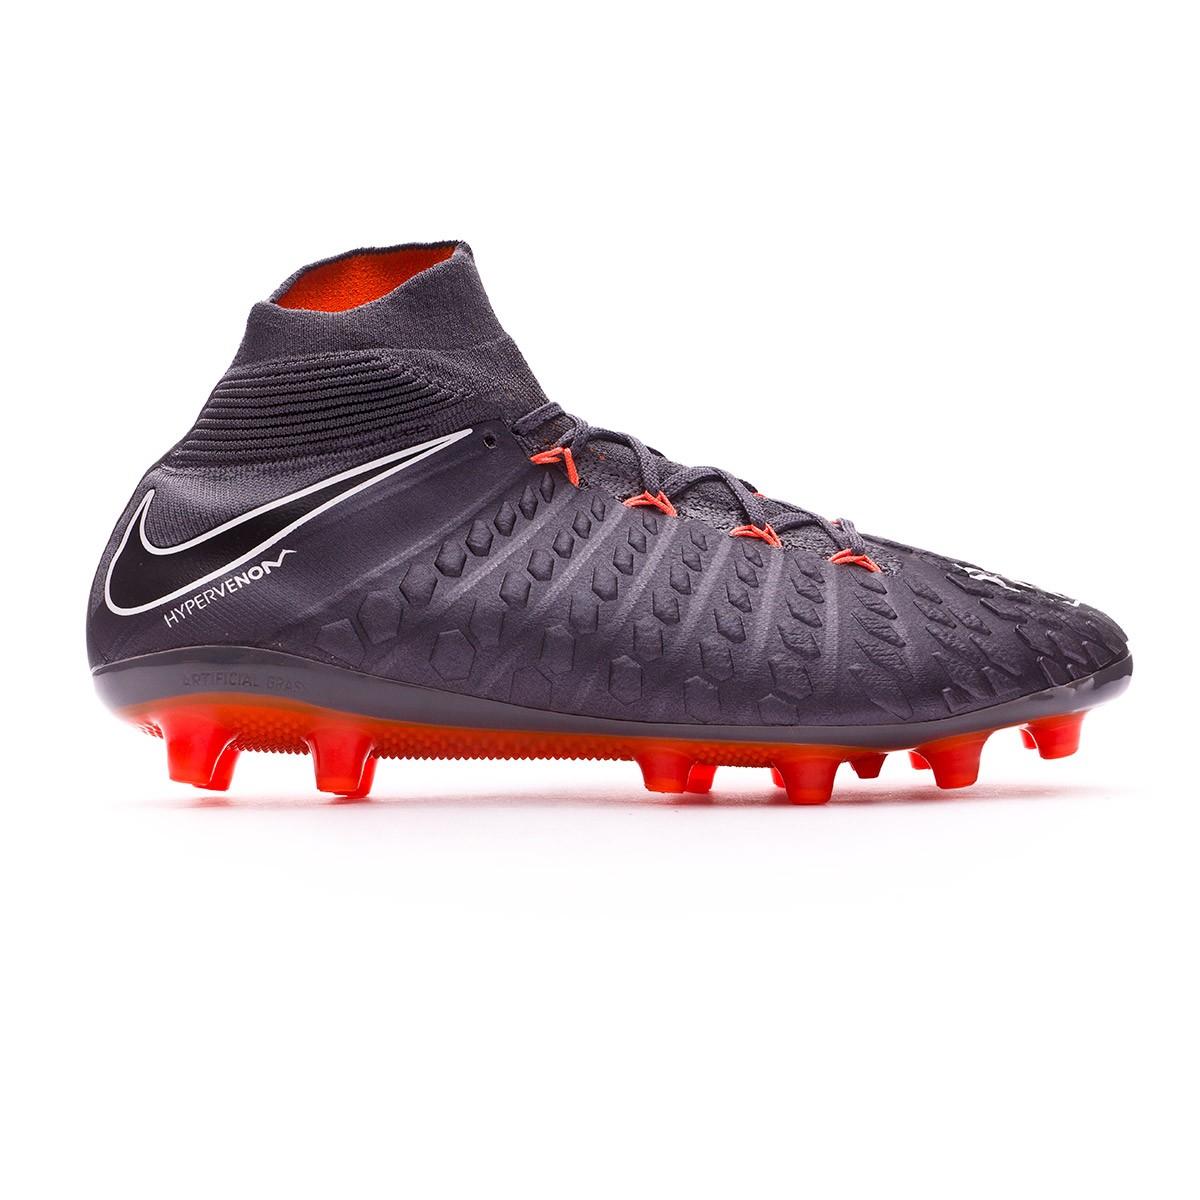 online retailer 5b236 dac63 Football Boots Nike Hypervenom Phantom III Elite DF AG-Pro Dark grey-Total  orange-White - Tienda de fútbol Fútbol Emotion